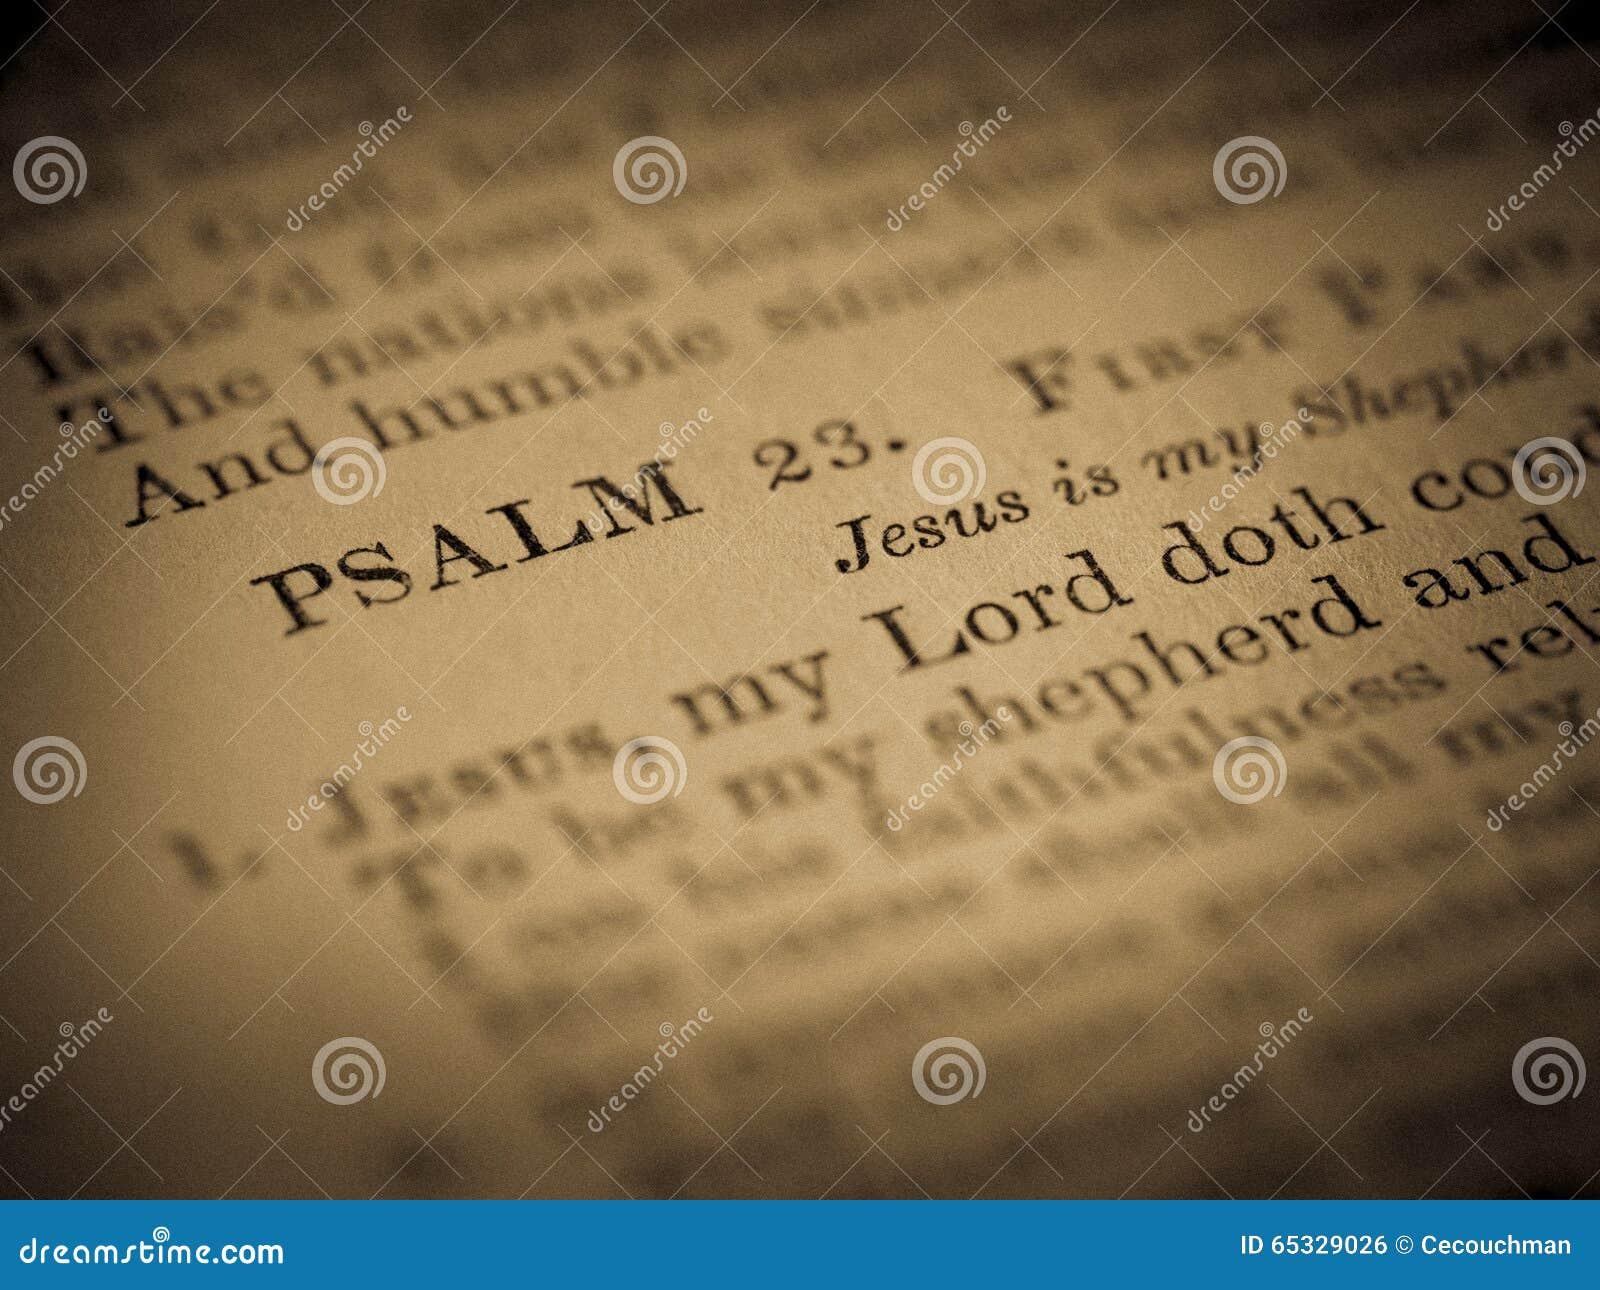 psalm 23 hymn